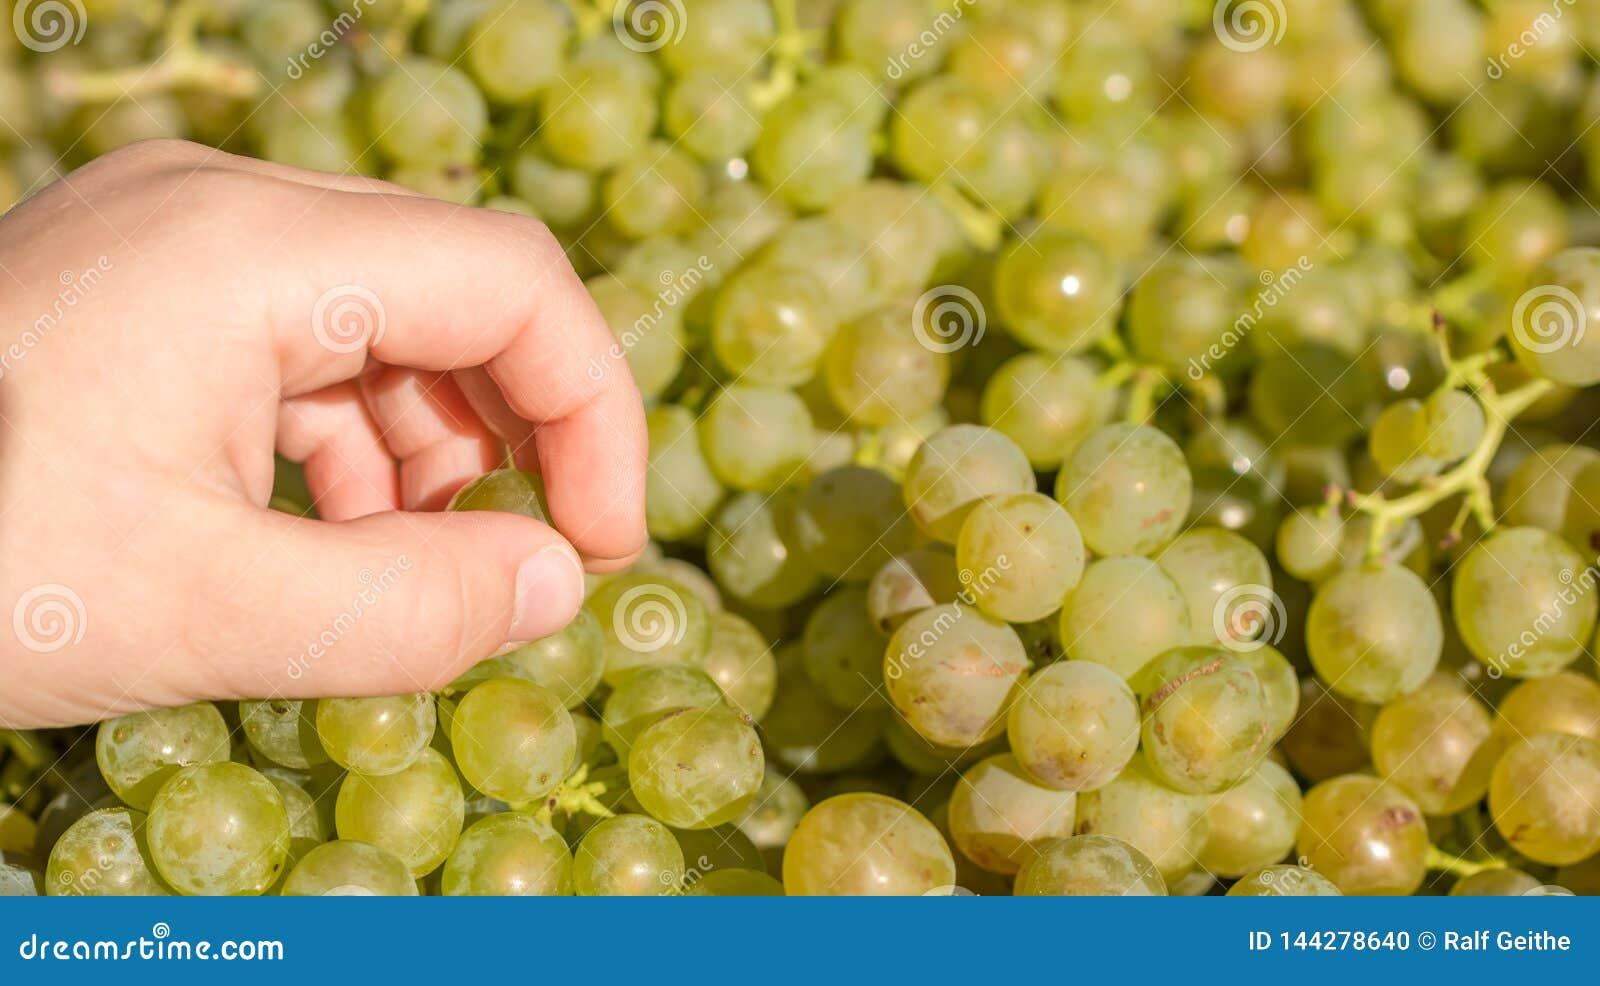 Рука ребенка пробует связку винограда на рынке